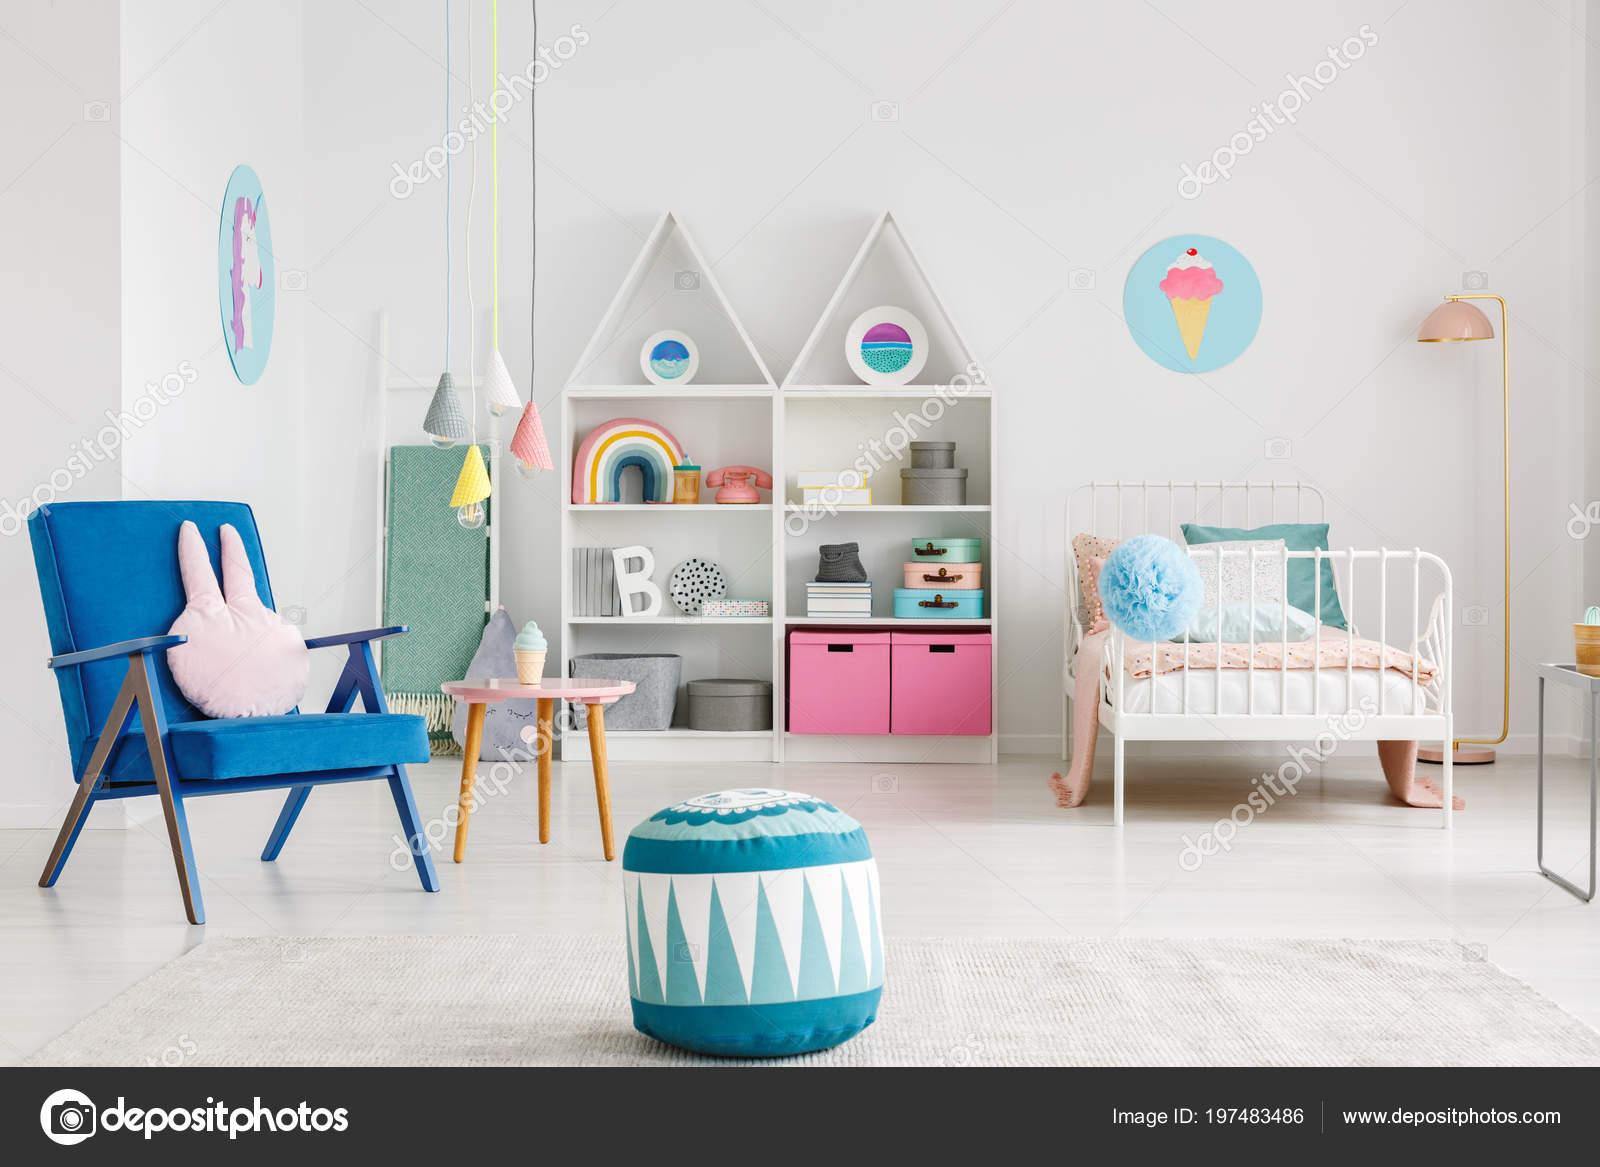 d99aa8738fd Μοτίβο Πουφ Κοντά Μπλε Πολυθρόνα Πολύχρωμο Παιδικό Δωμάτιο Εσωτερικό Μια — Φωτογραφία  Αρχείου